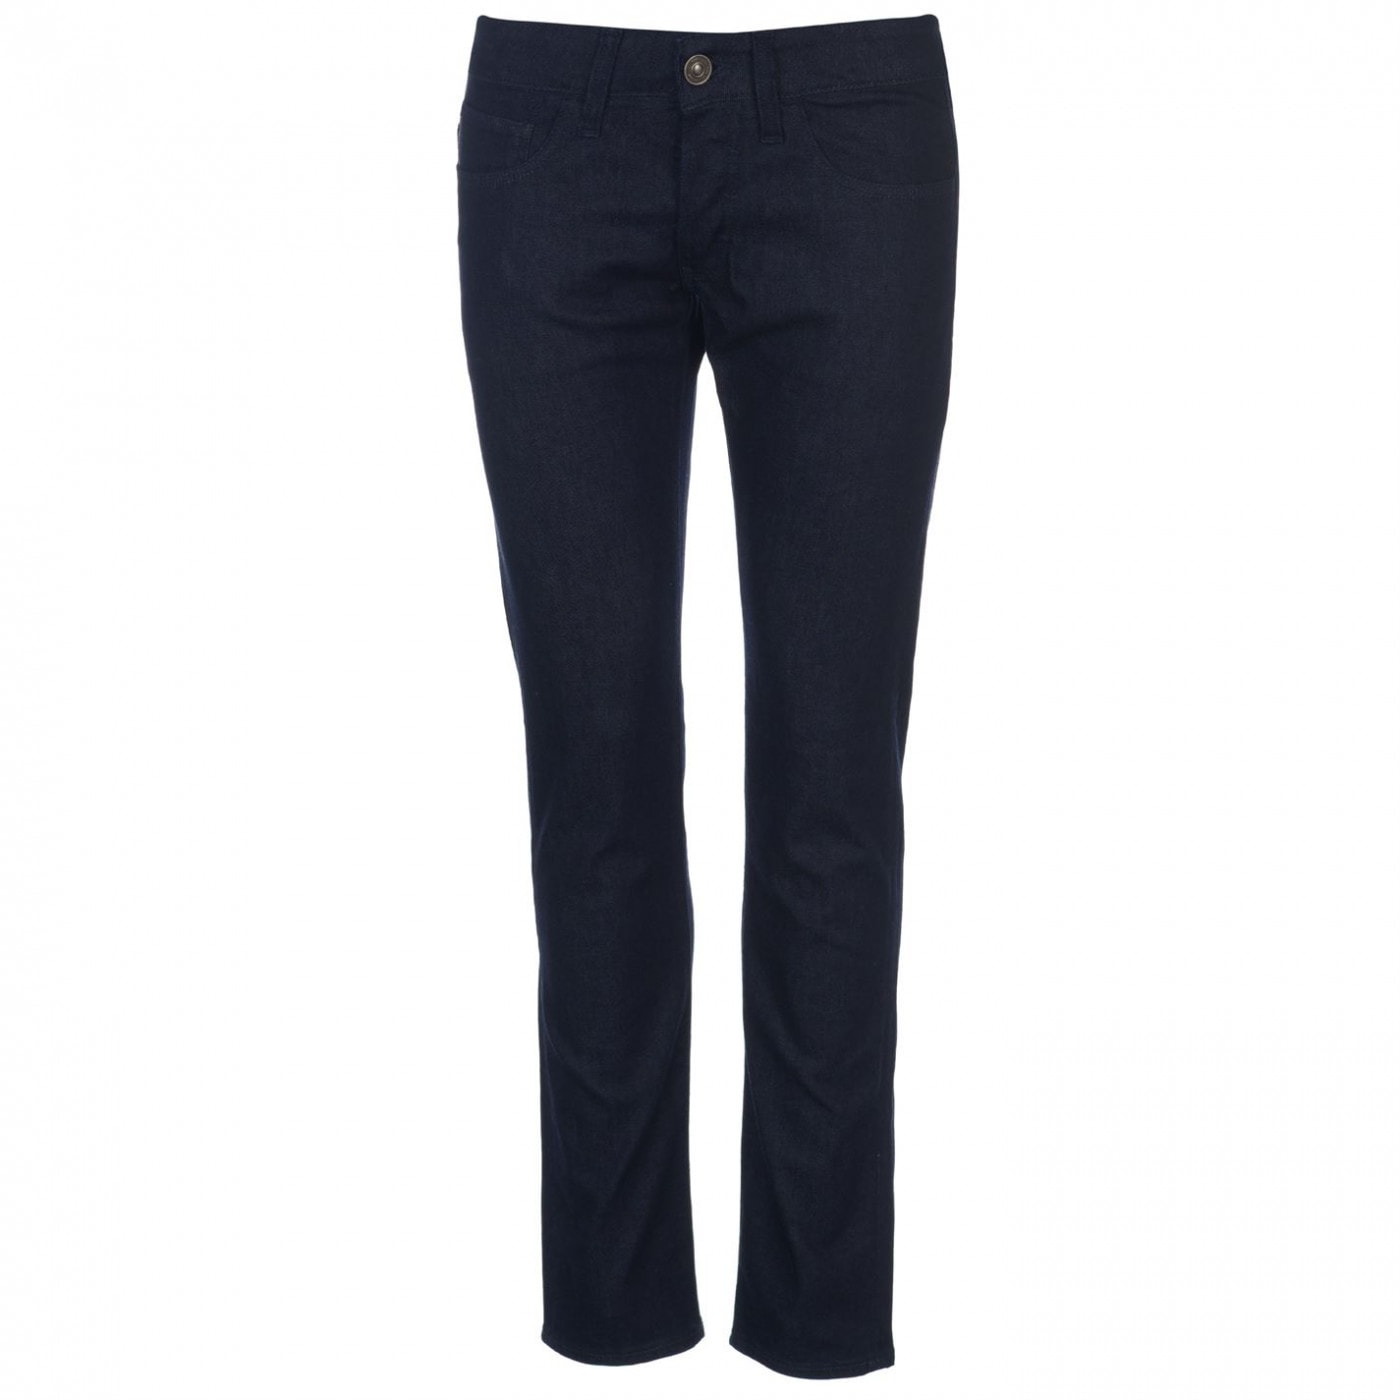 G Star 50859 Slim Jeans